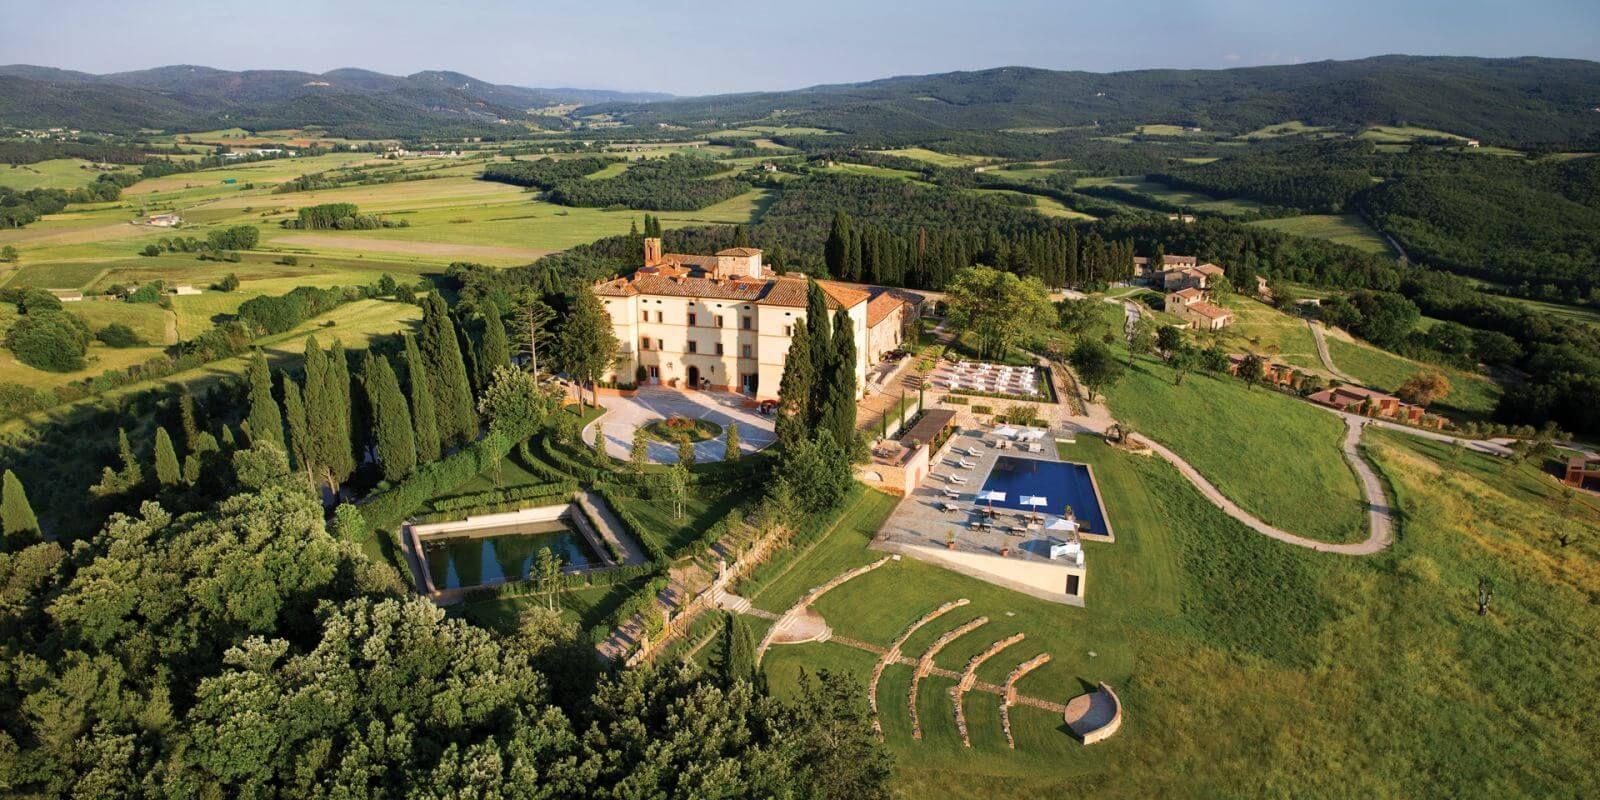 castello-di-casole-home-aerial-tiny.jpg